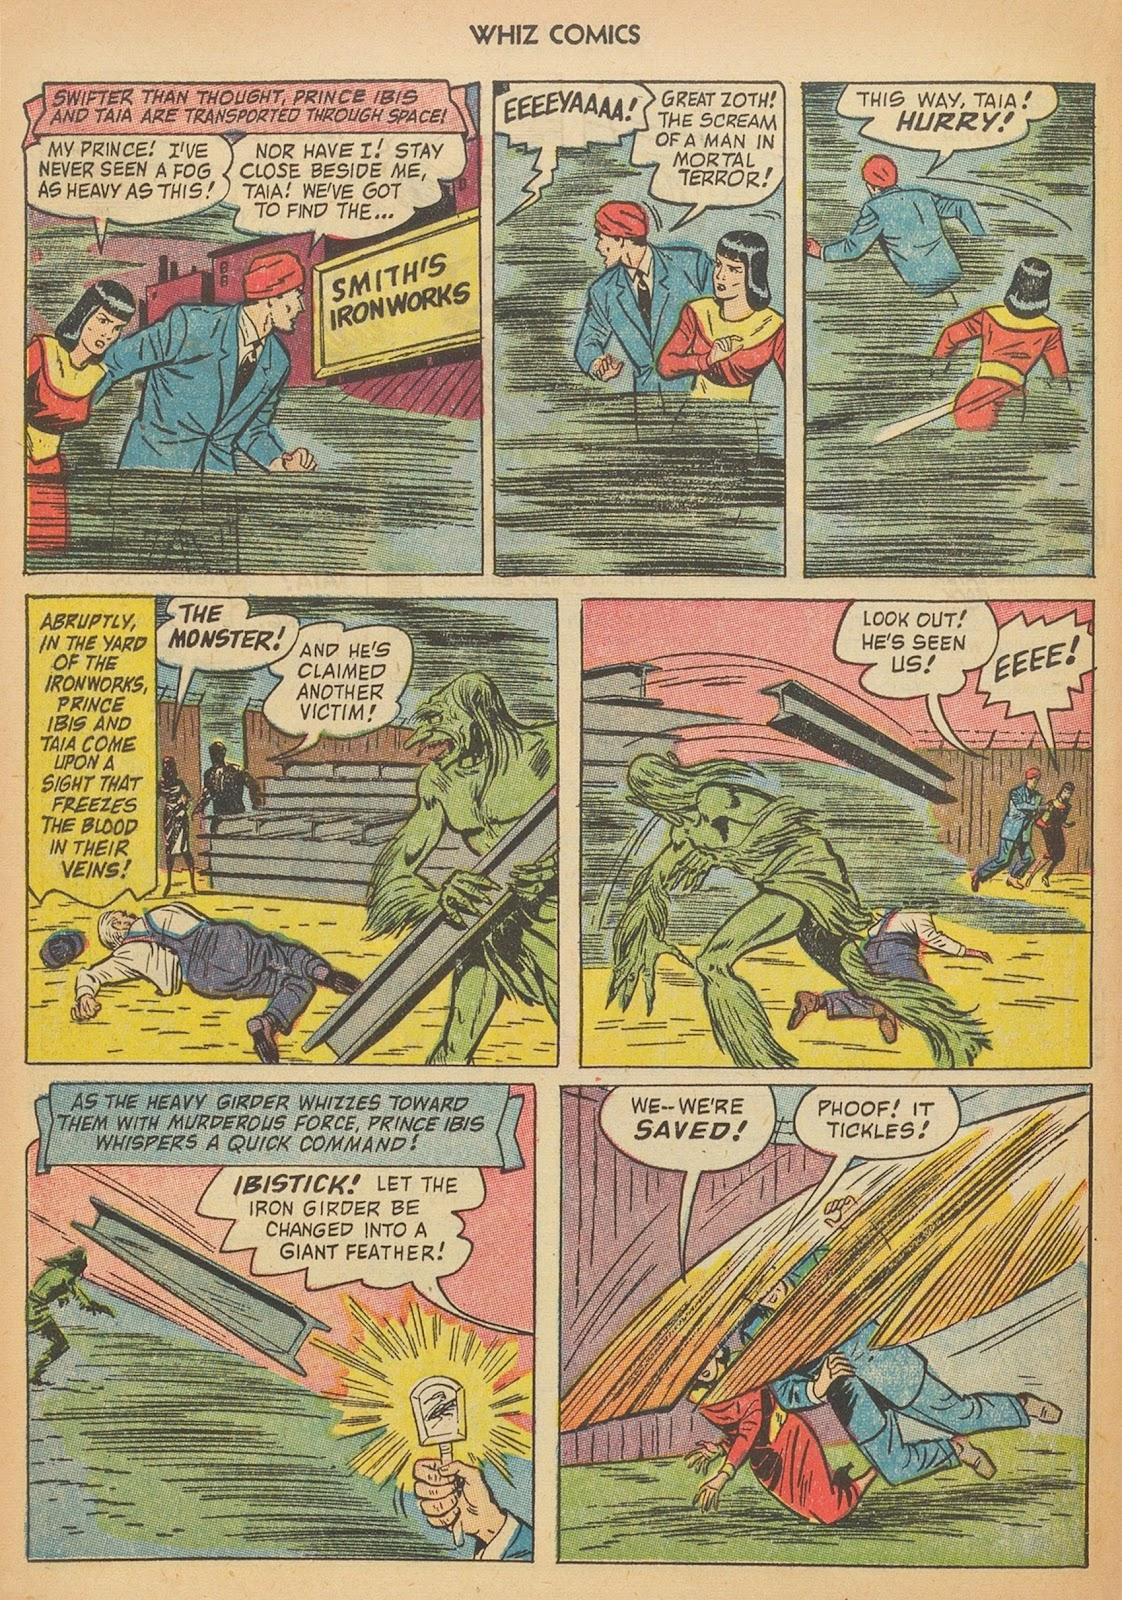 Read online WHIZ Comics comic -  Issue #153 - 12